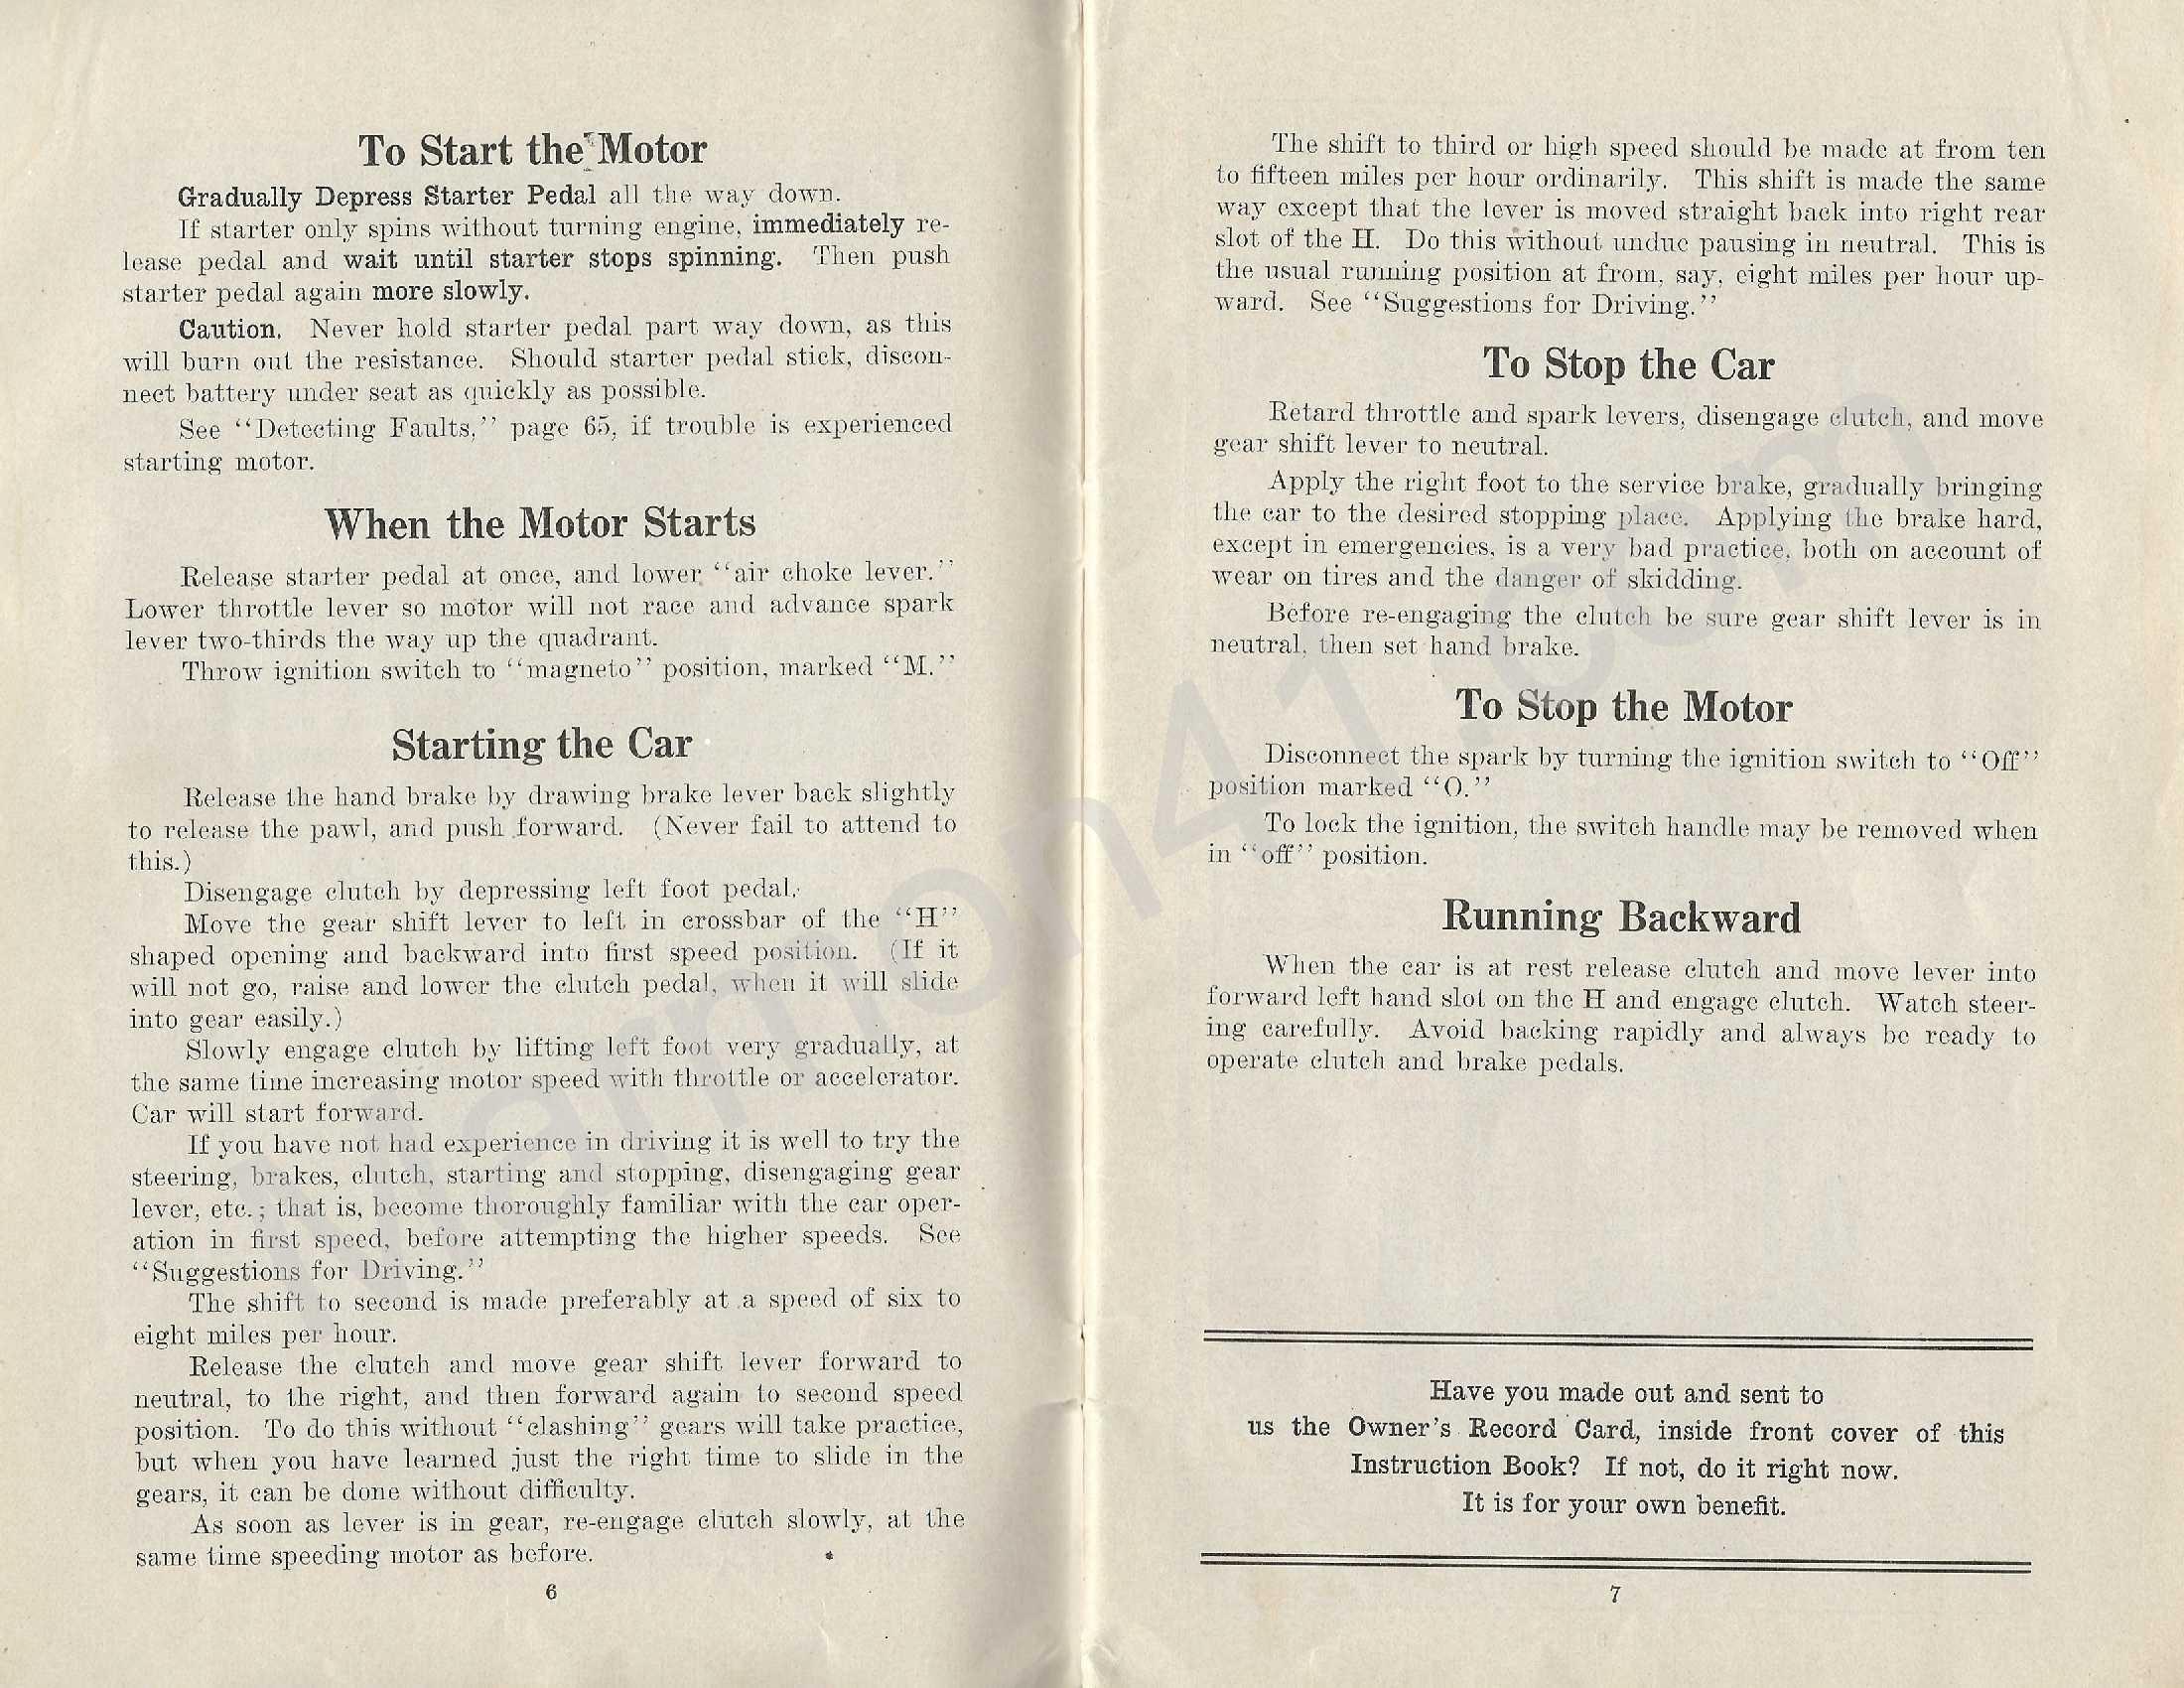 1915-07-01_Marmon41_Info_Book_1534-B_5